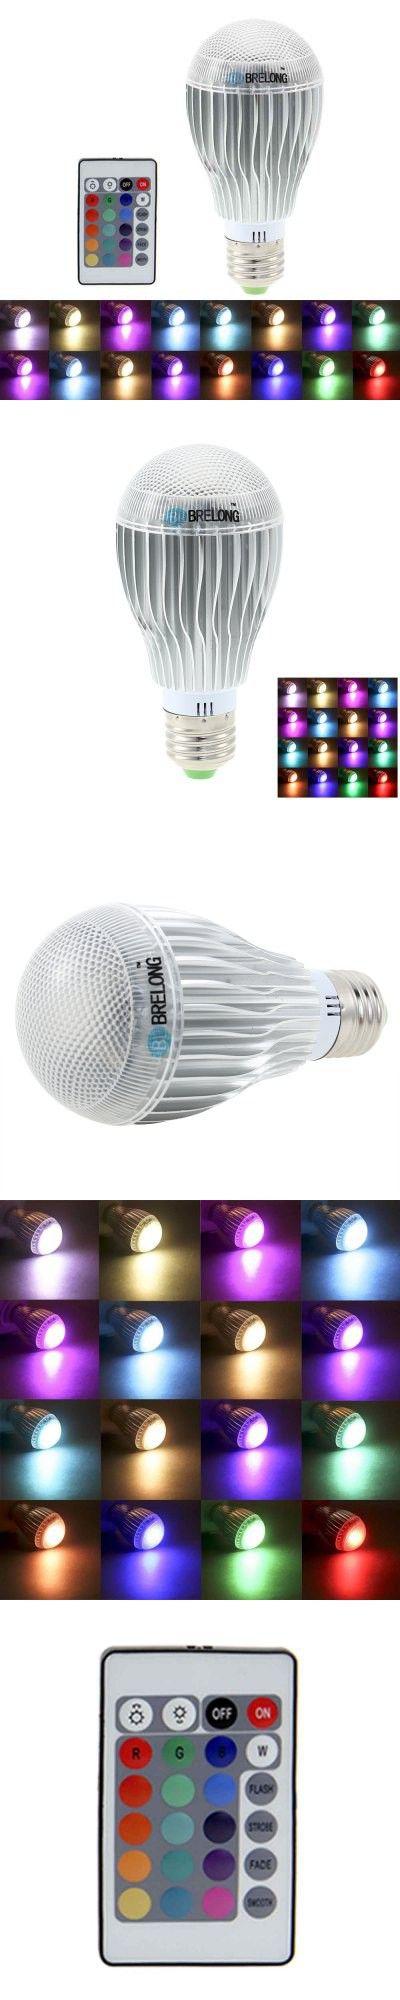 Online yuv color picker - Led Light Bulbs Brelong E27 400lm 16 Color Changing 10w Rgb Led Bulb 24